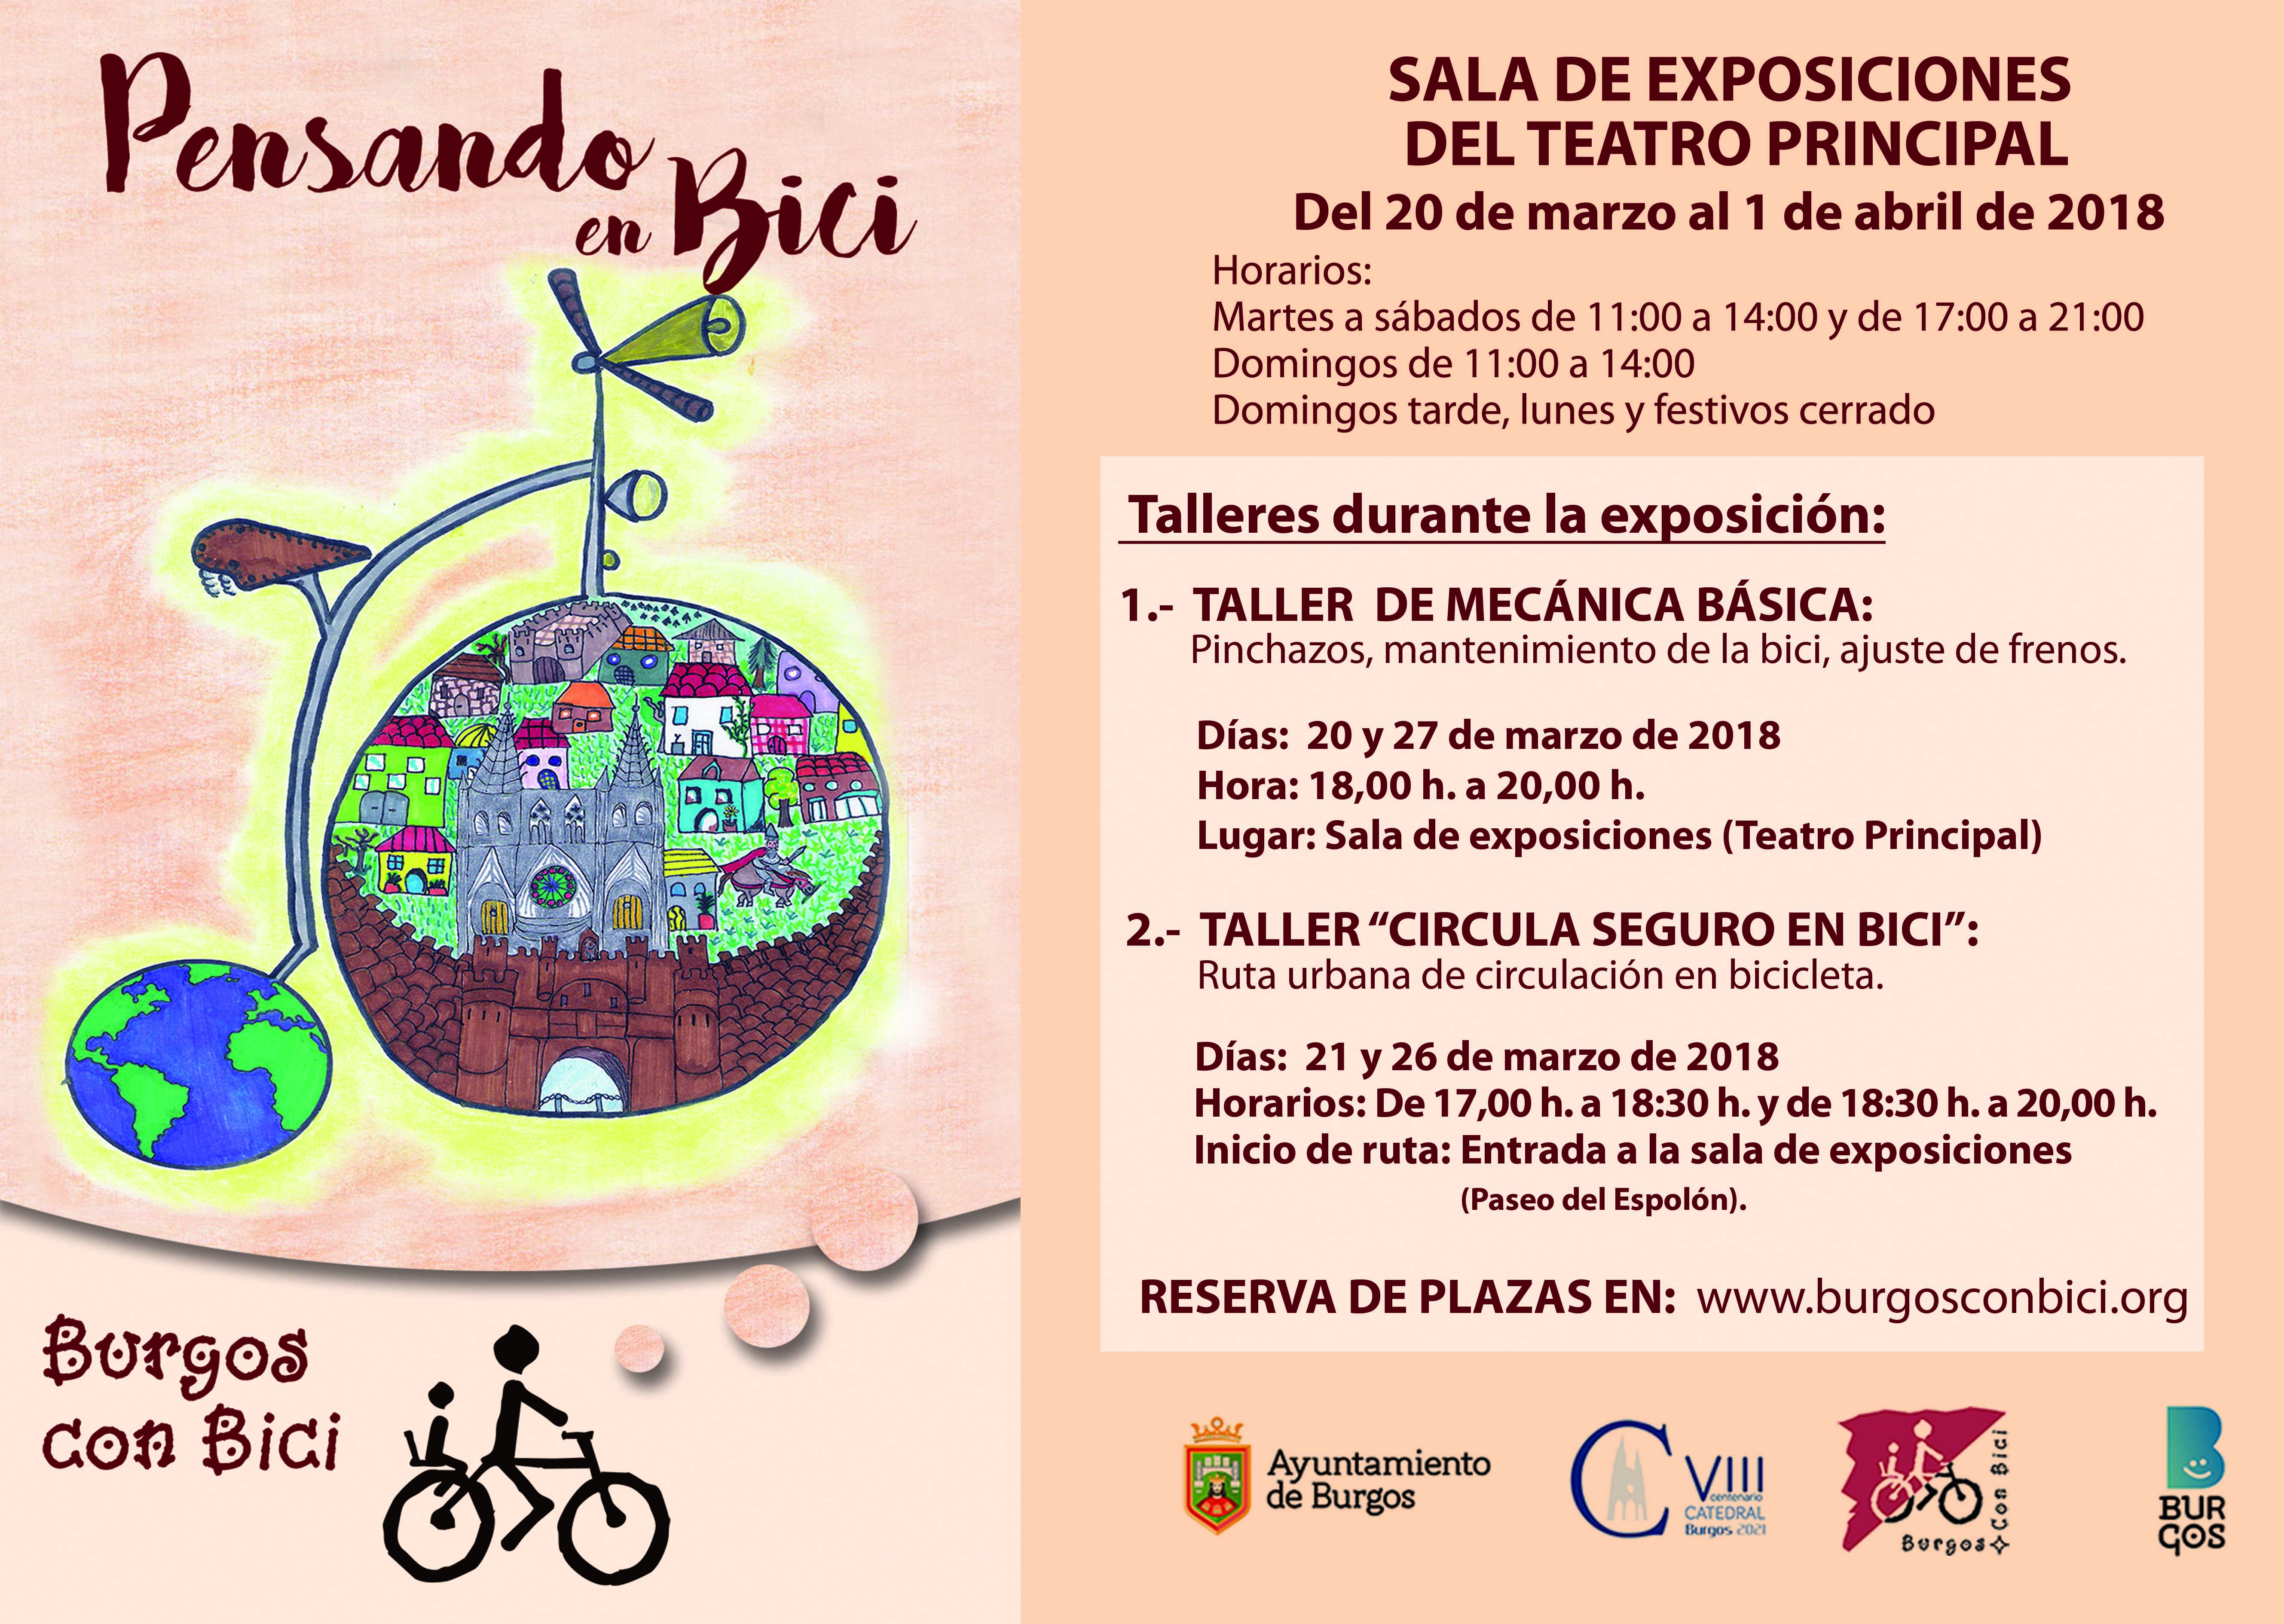 Cartel e información de fechas de exposición Pensando en bici y talleres de mecánica y de circulación segura en bici